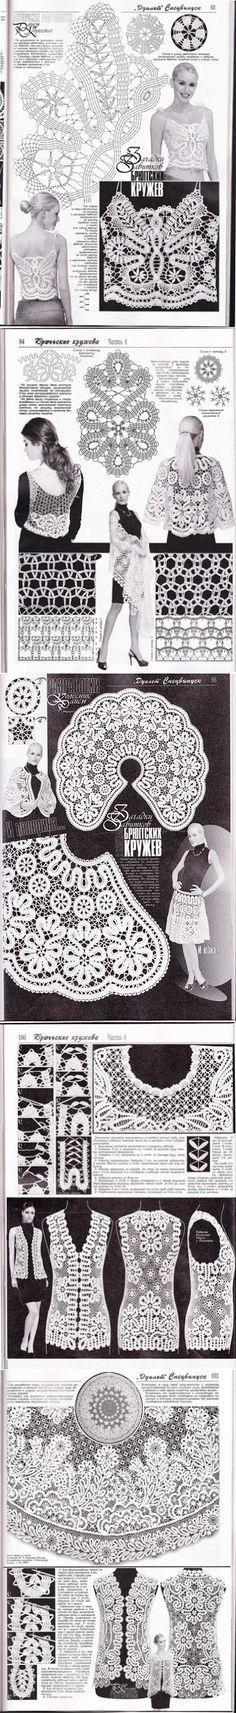 645 best Blusas y vestidos a crochet images on Pinterest ...